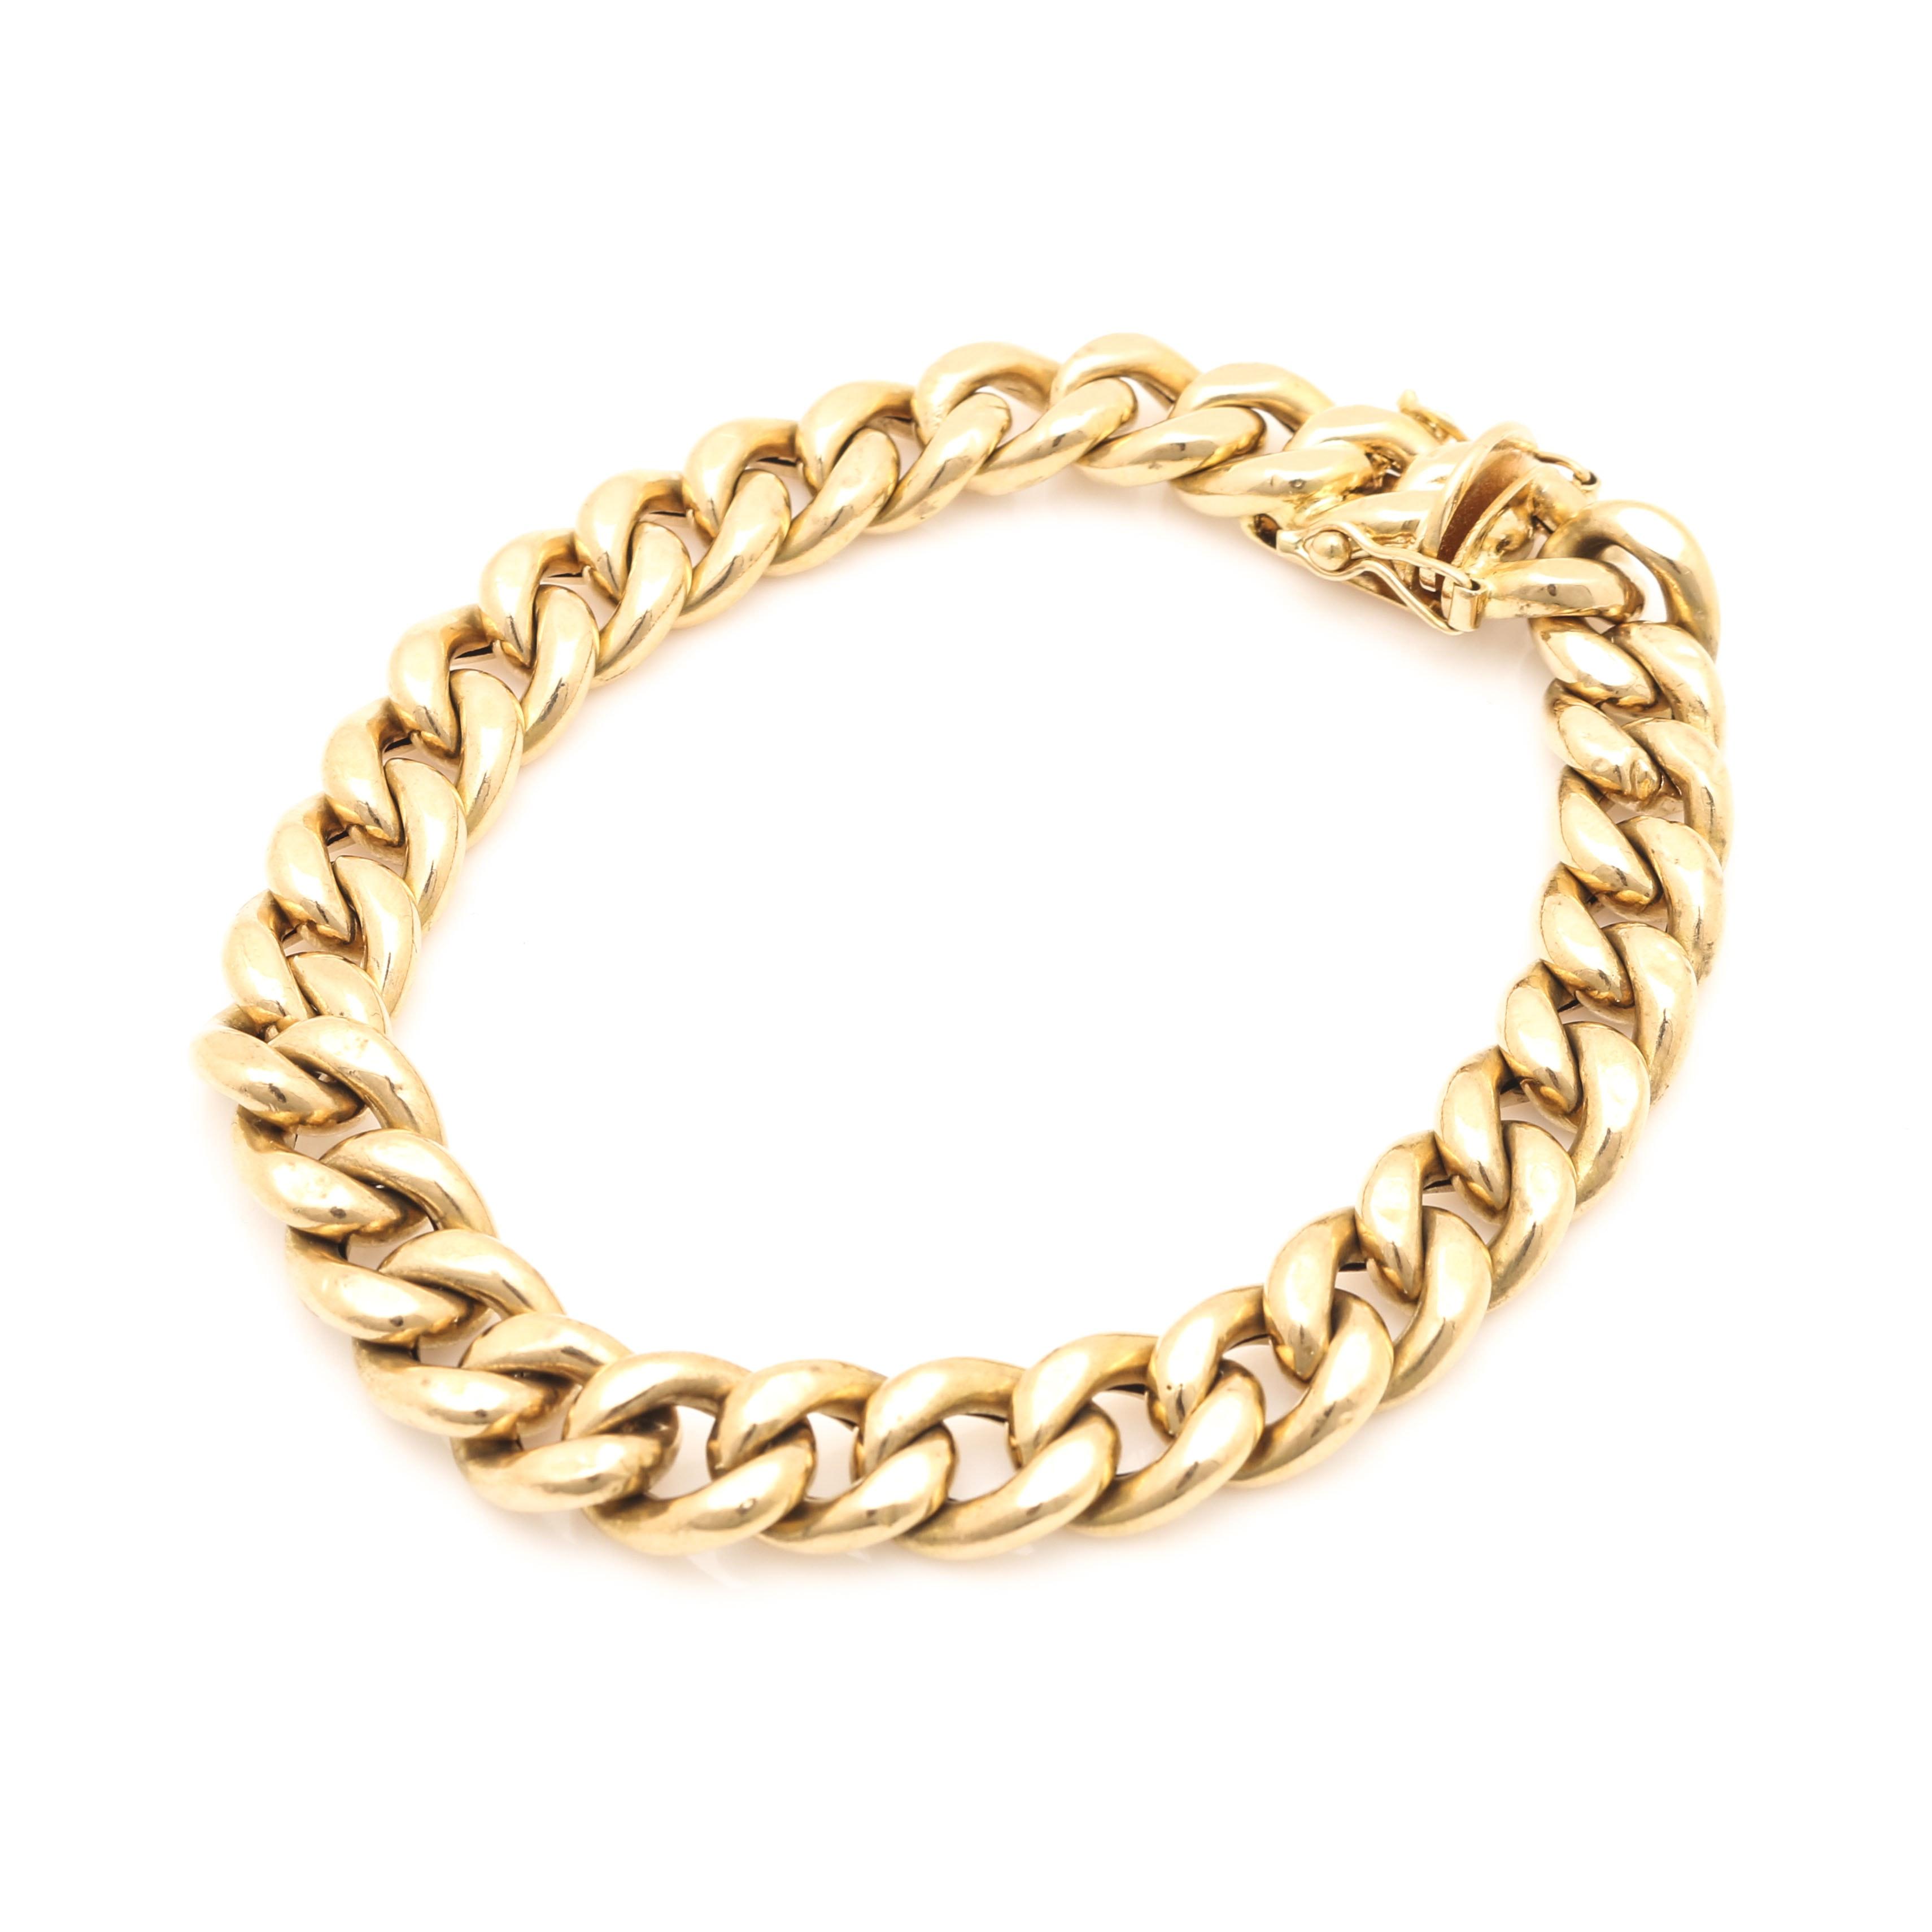 18K Yellow Gold Curb Chain Bracelet